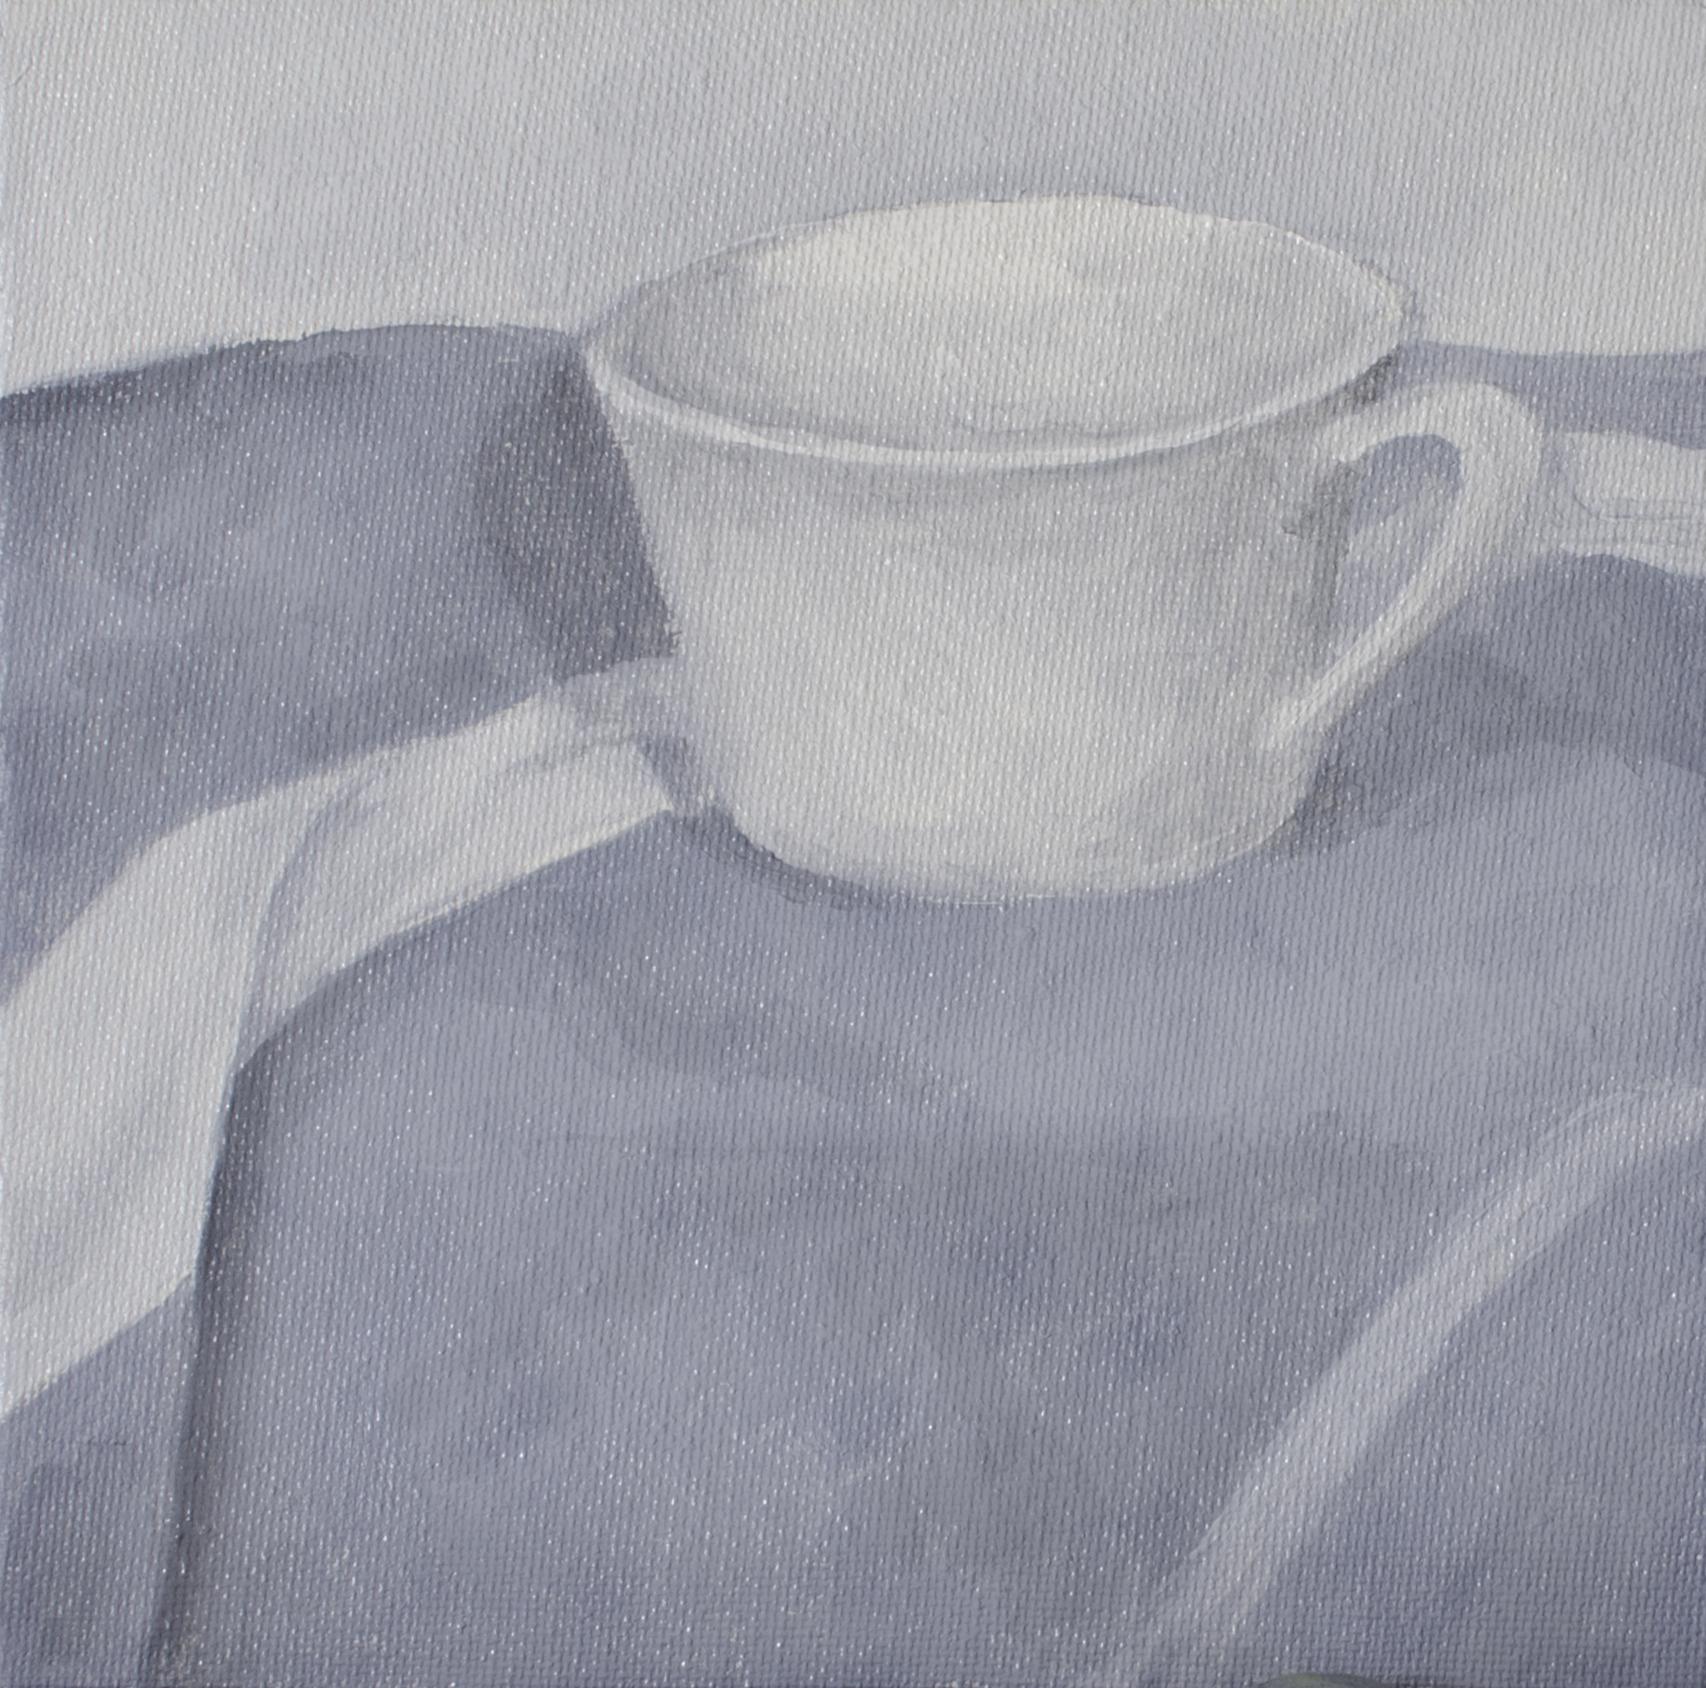 Teacup, Jul 7, 2015, Oil on Canvas Board, 6